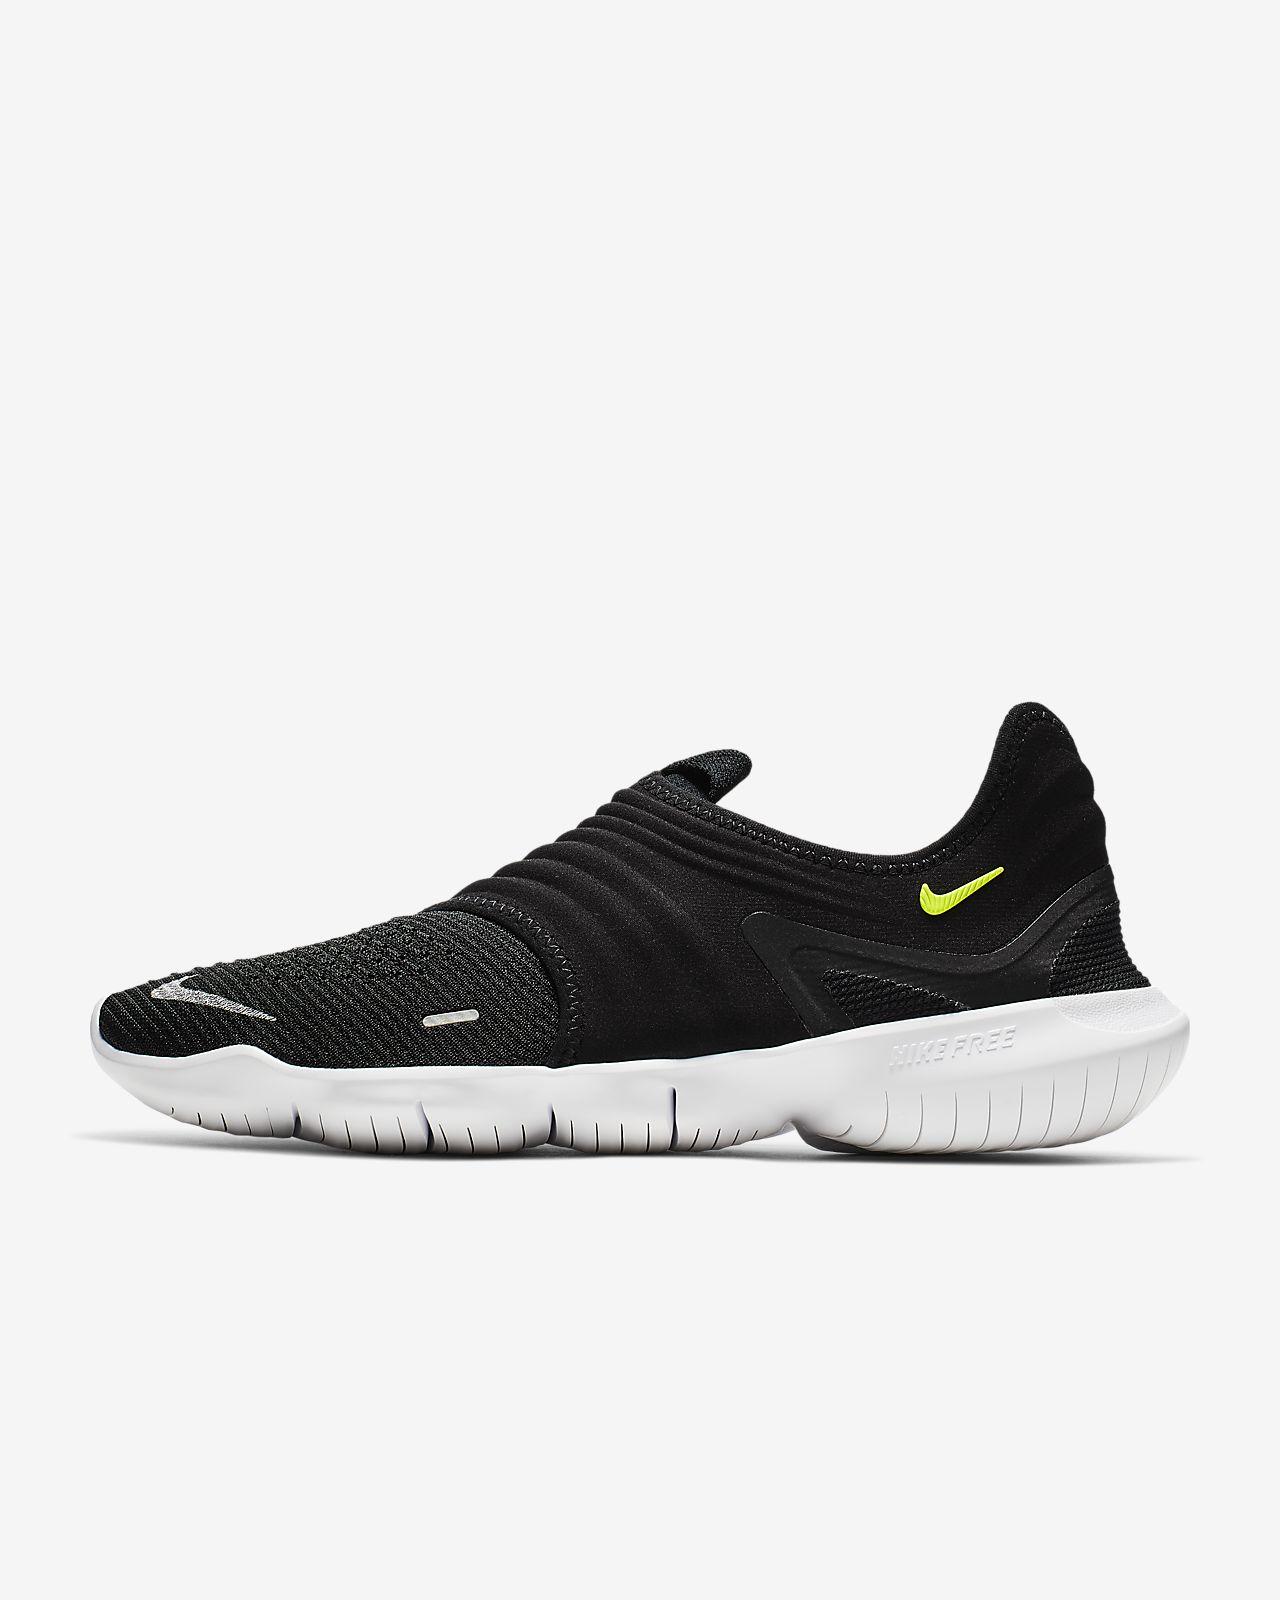 Nike Free RN Flyknit 3.0 男子跑步鞋